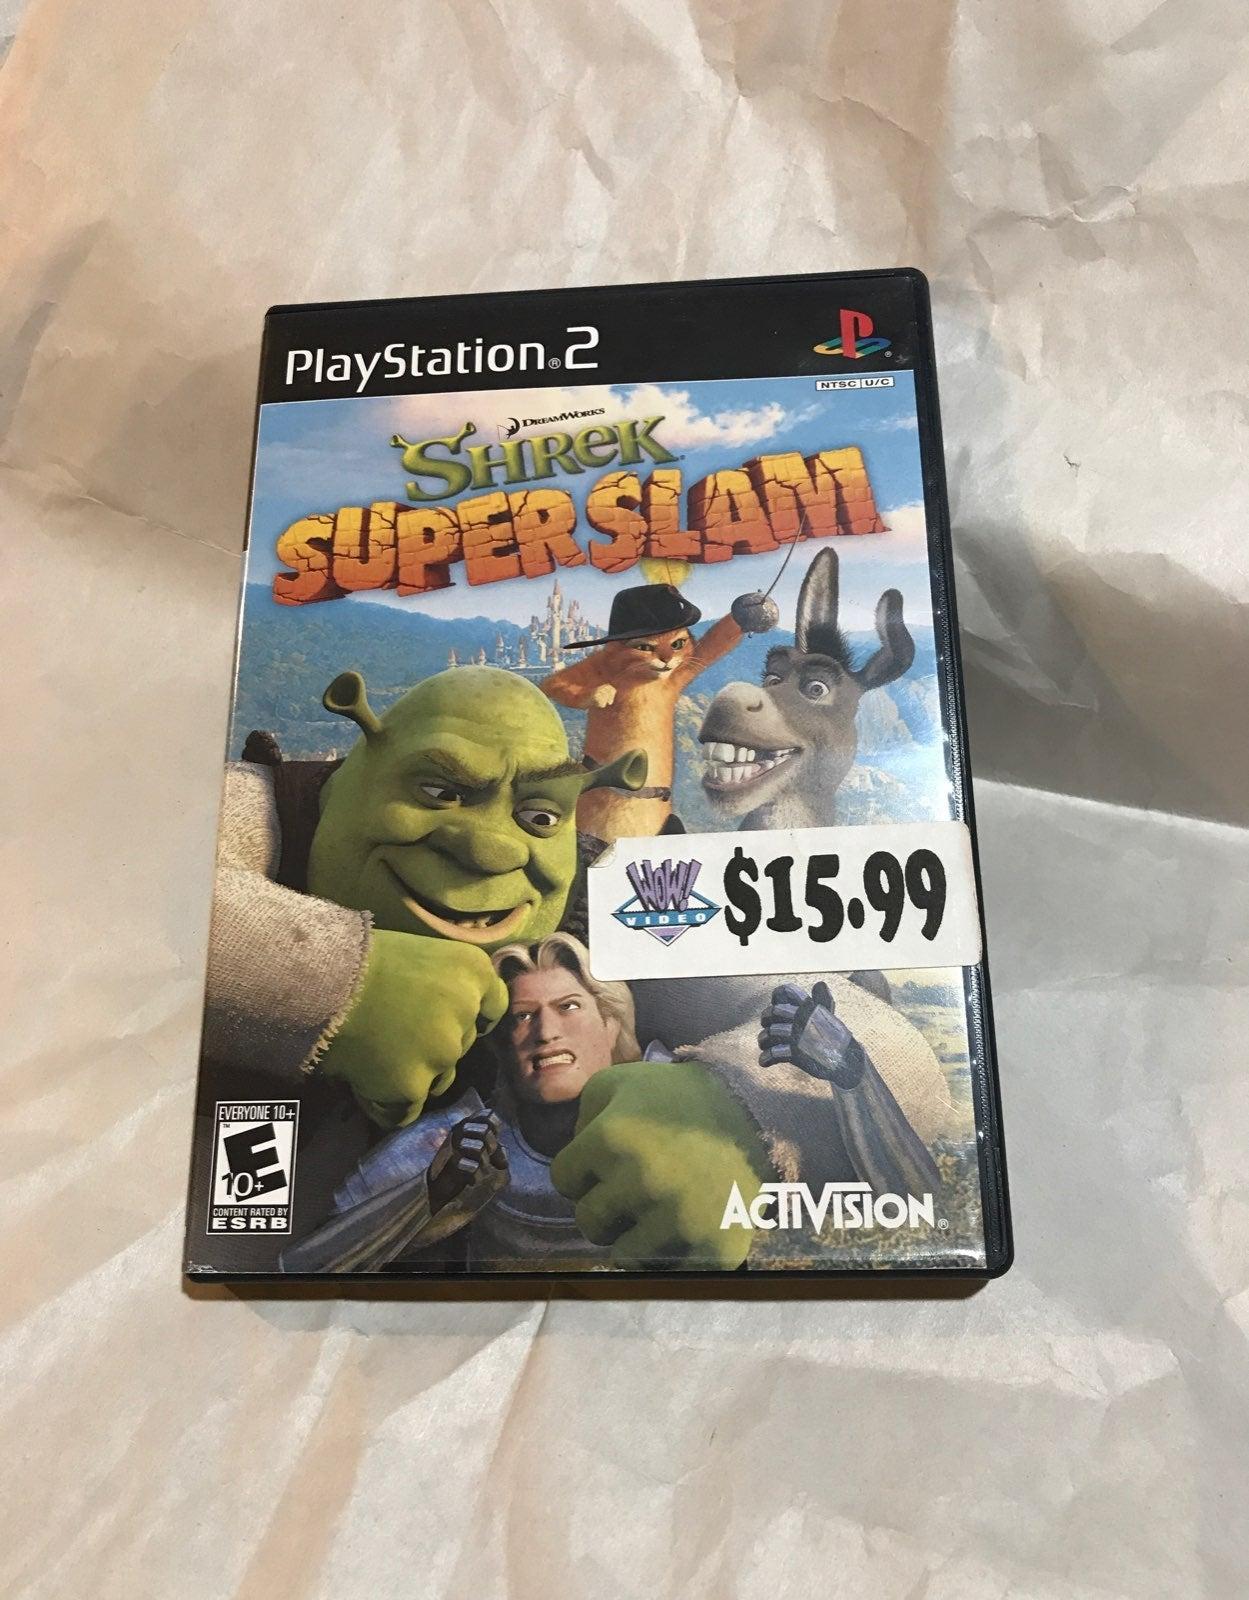 PS2 SHREK SUPER SLAM Game Playstation 2